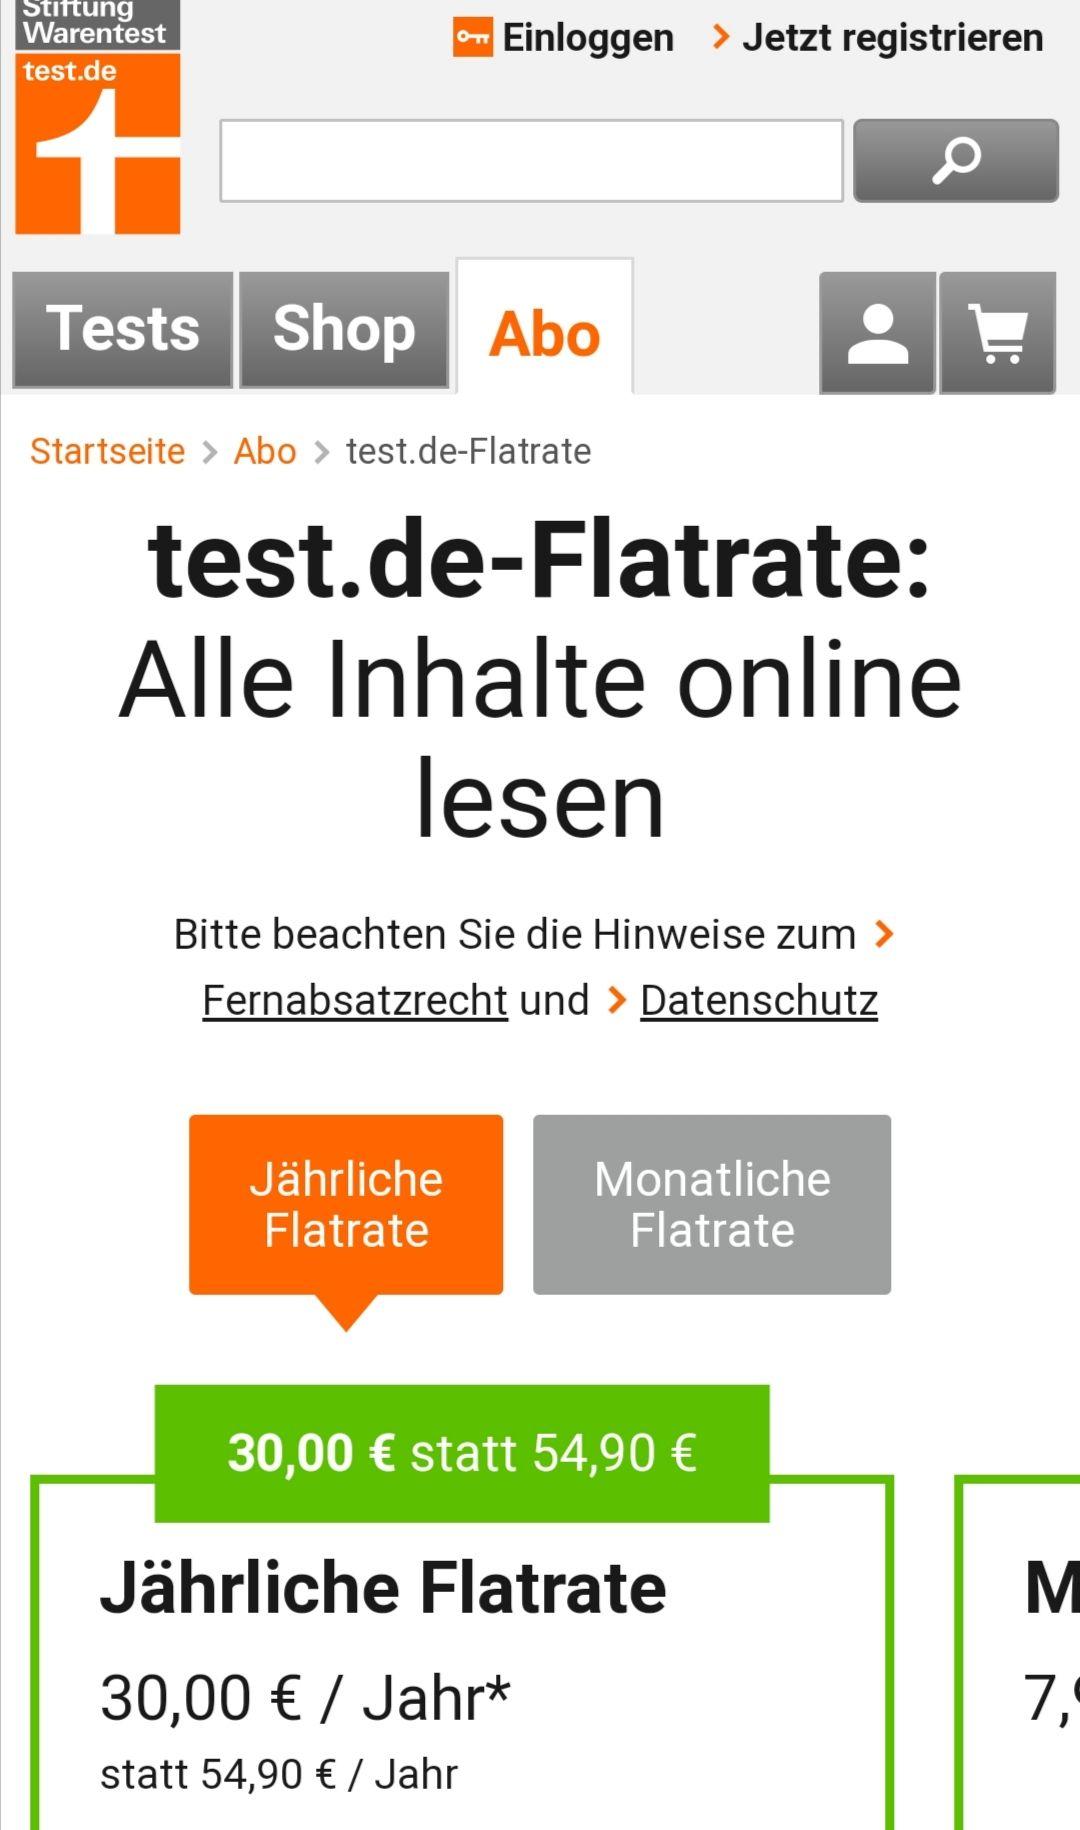 Stiftung Warentest & Finanztest Flatrate 30,00 statt 54,90 Euro